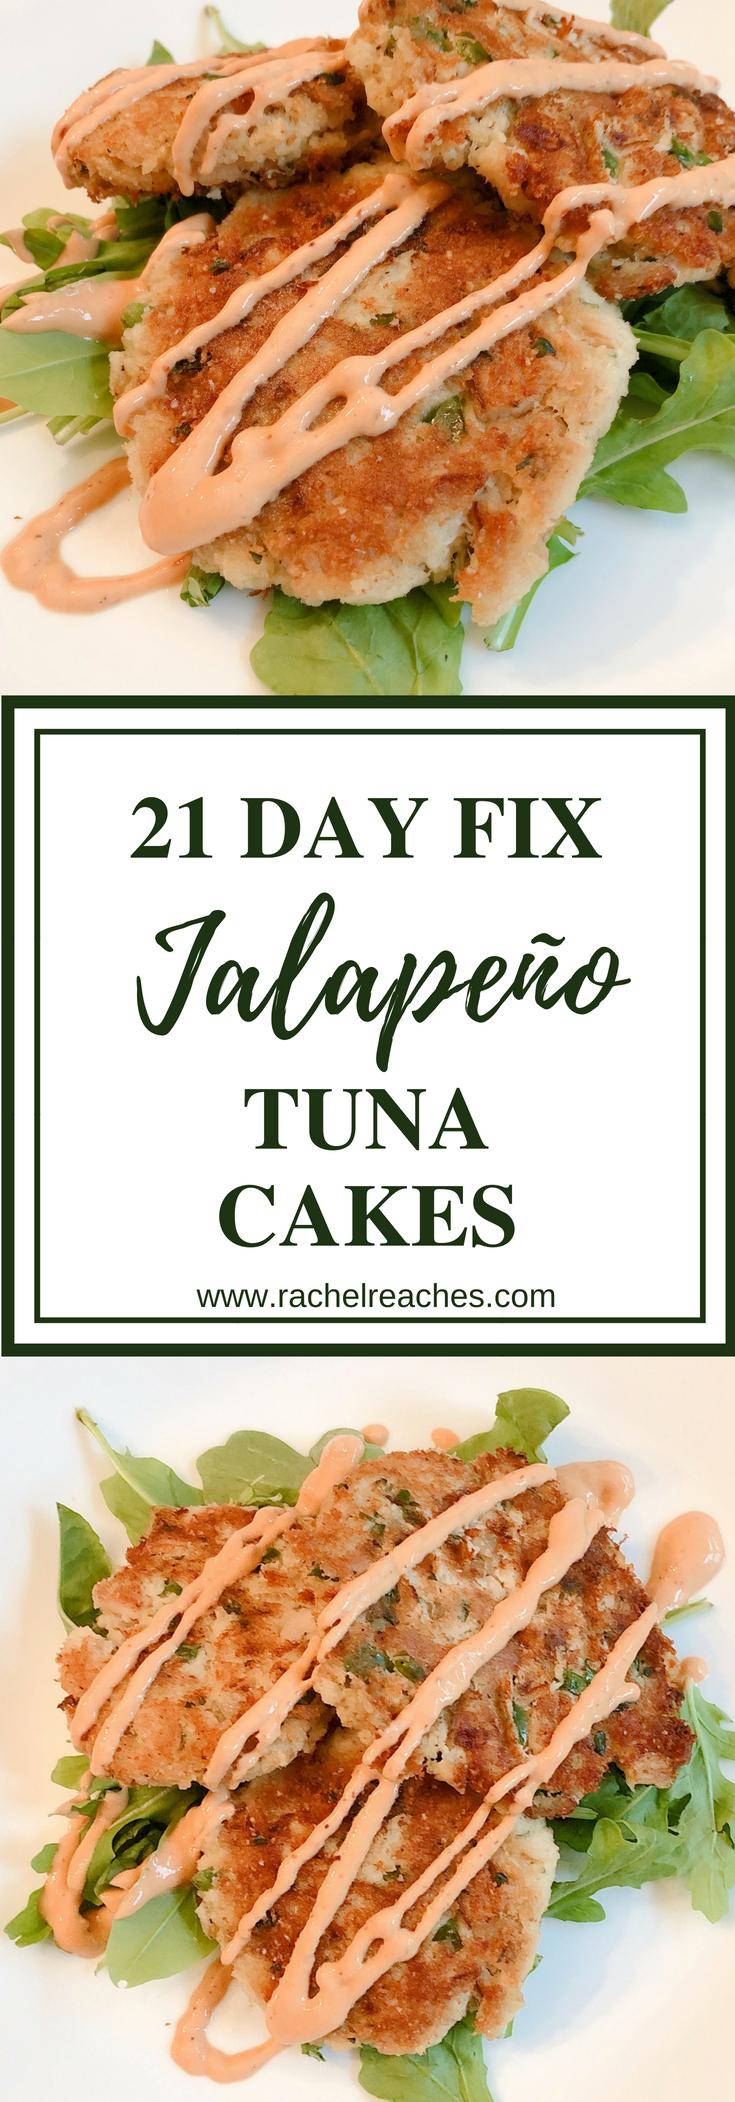 Jalapeno Tuna Cakes Pin - 21 Day Fix.png